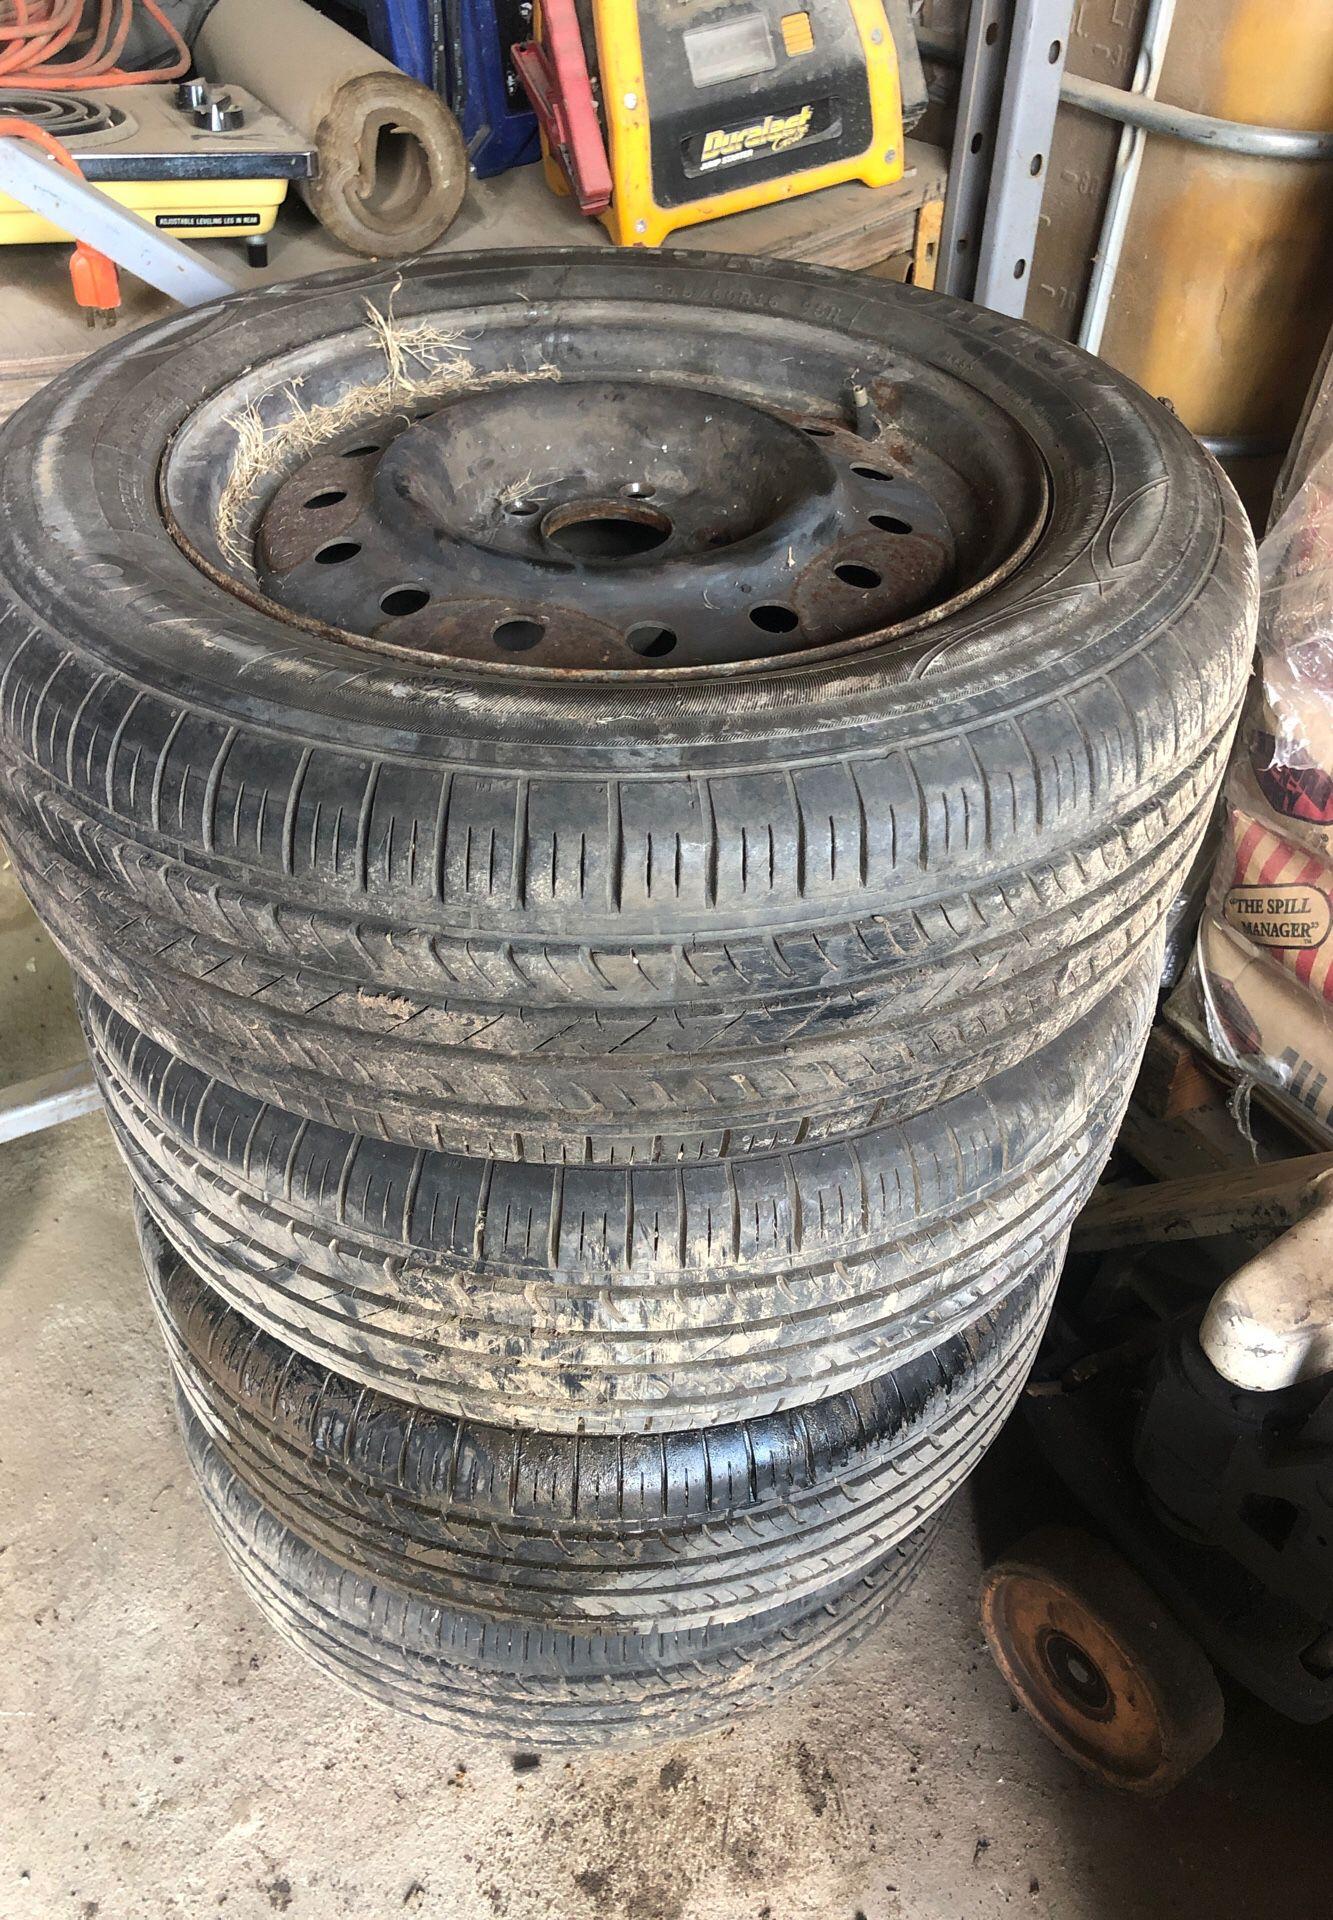 04 Nissan Altima. 215/60r16